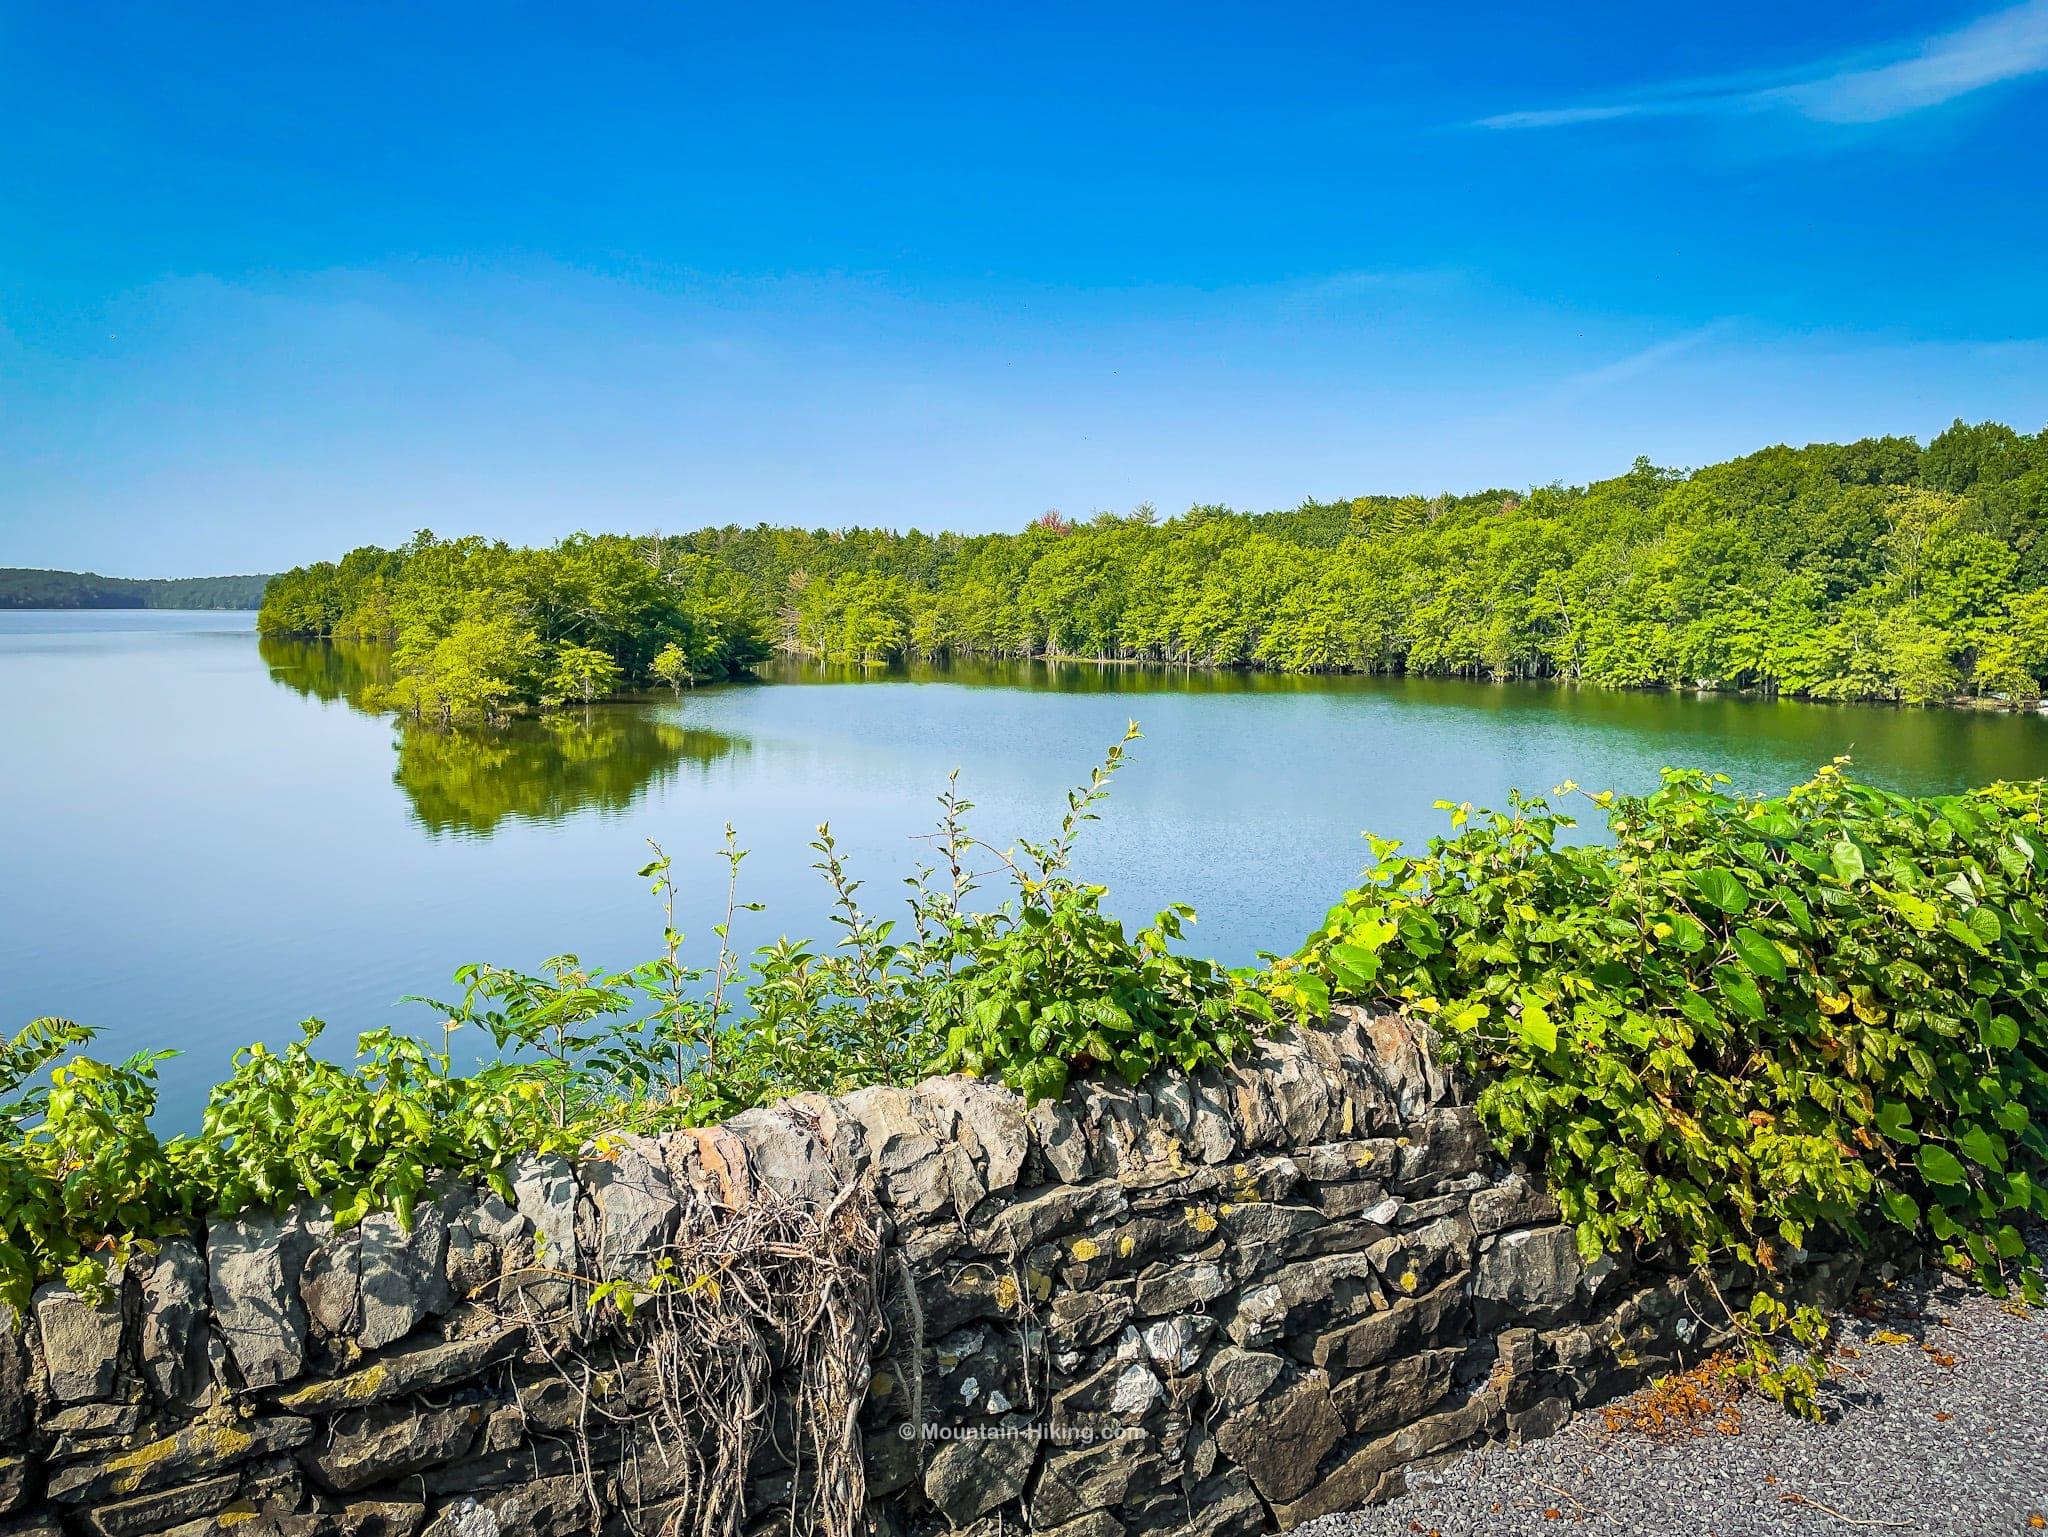 Ashokan Rail Trail scenic water view